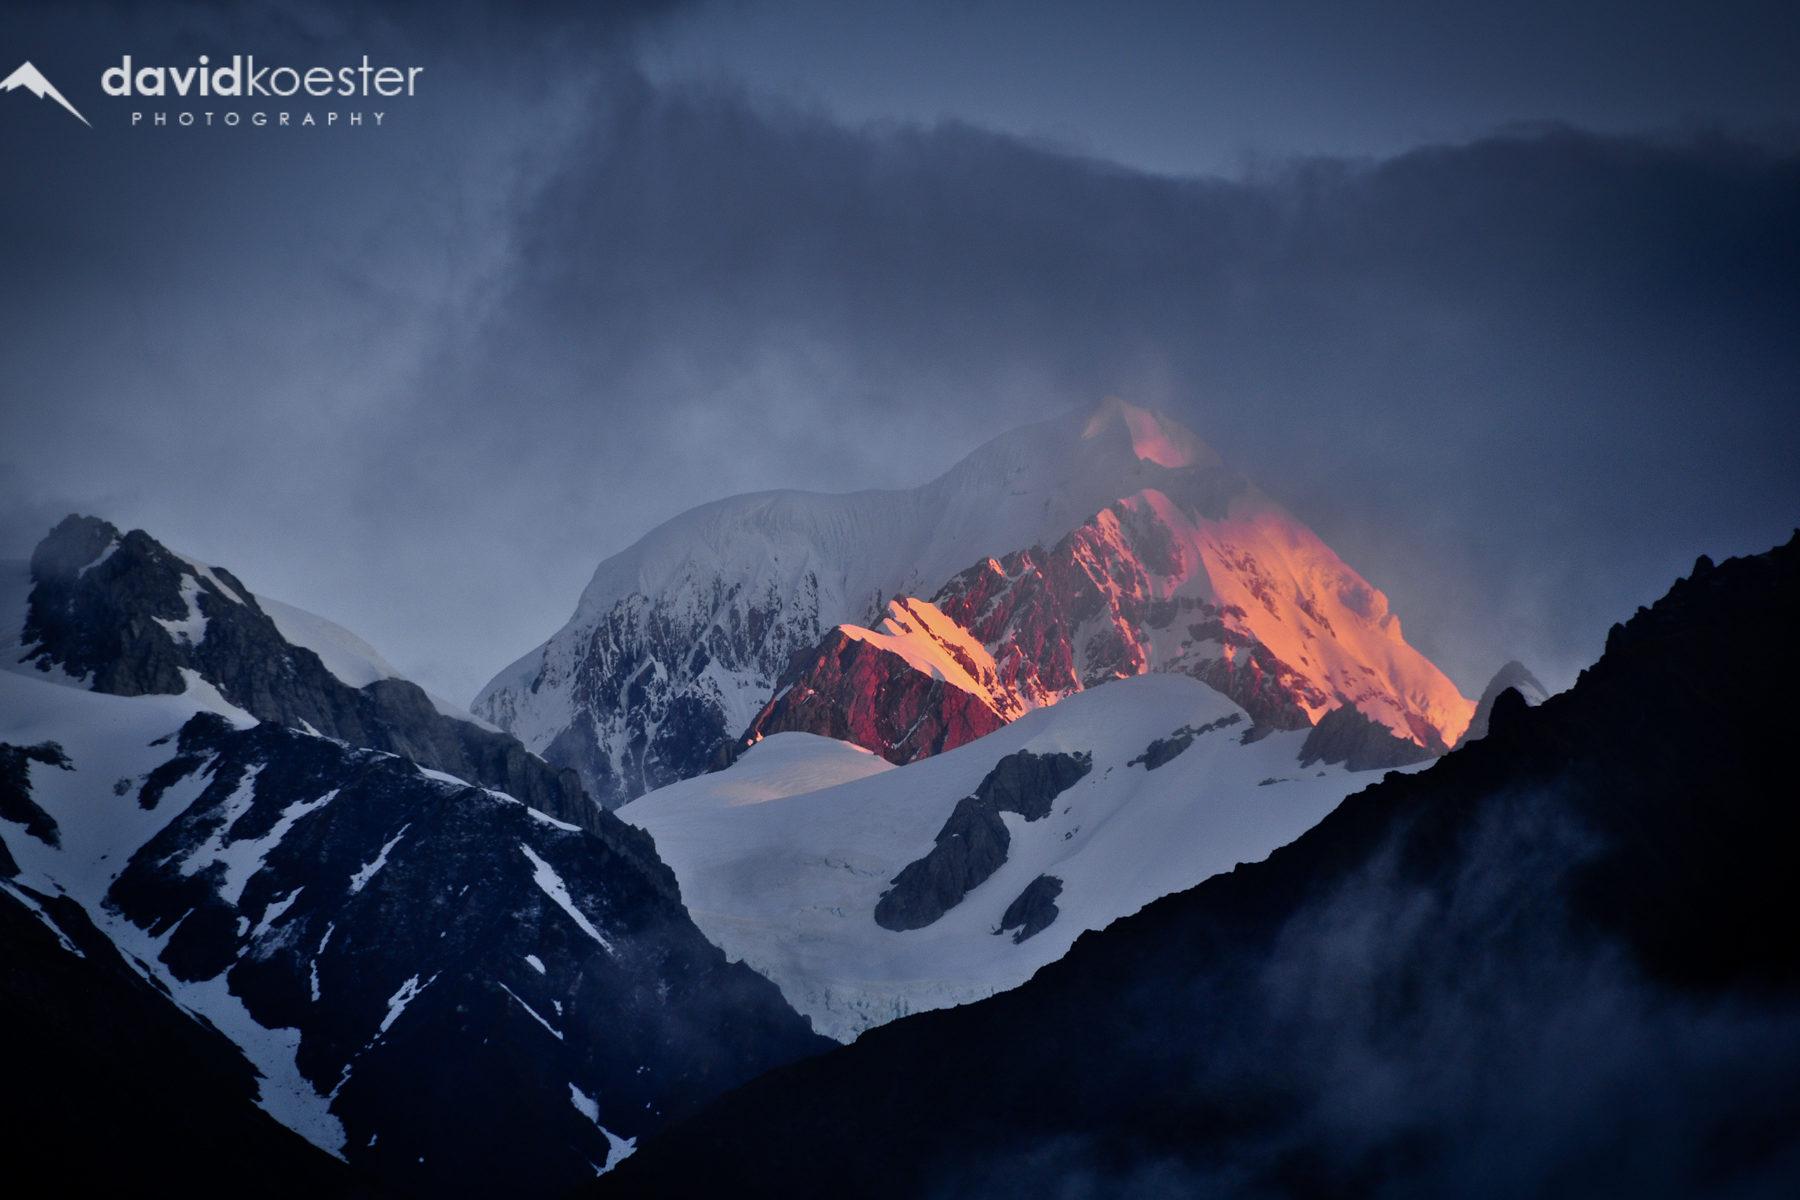 Neuseeland Wallpaper 1 | Mount Cook, Aoraki, Berge, Sonnenuntergang, Gebirge, Winter, Hintergrundbild, Desktopbild, Bildschirmhintergrund | 1920×1080